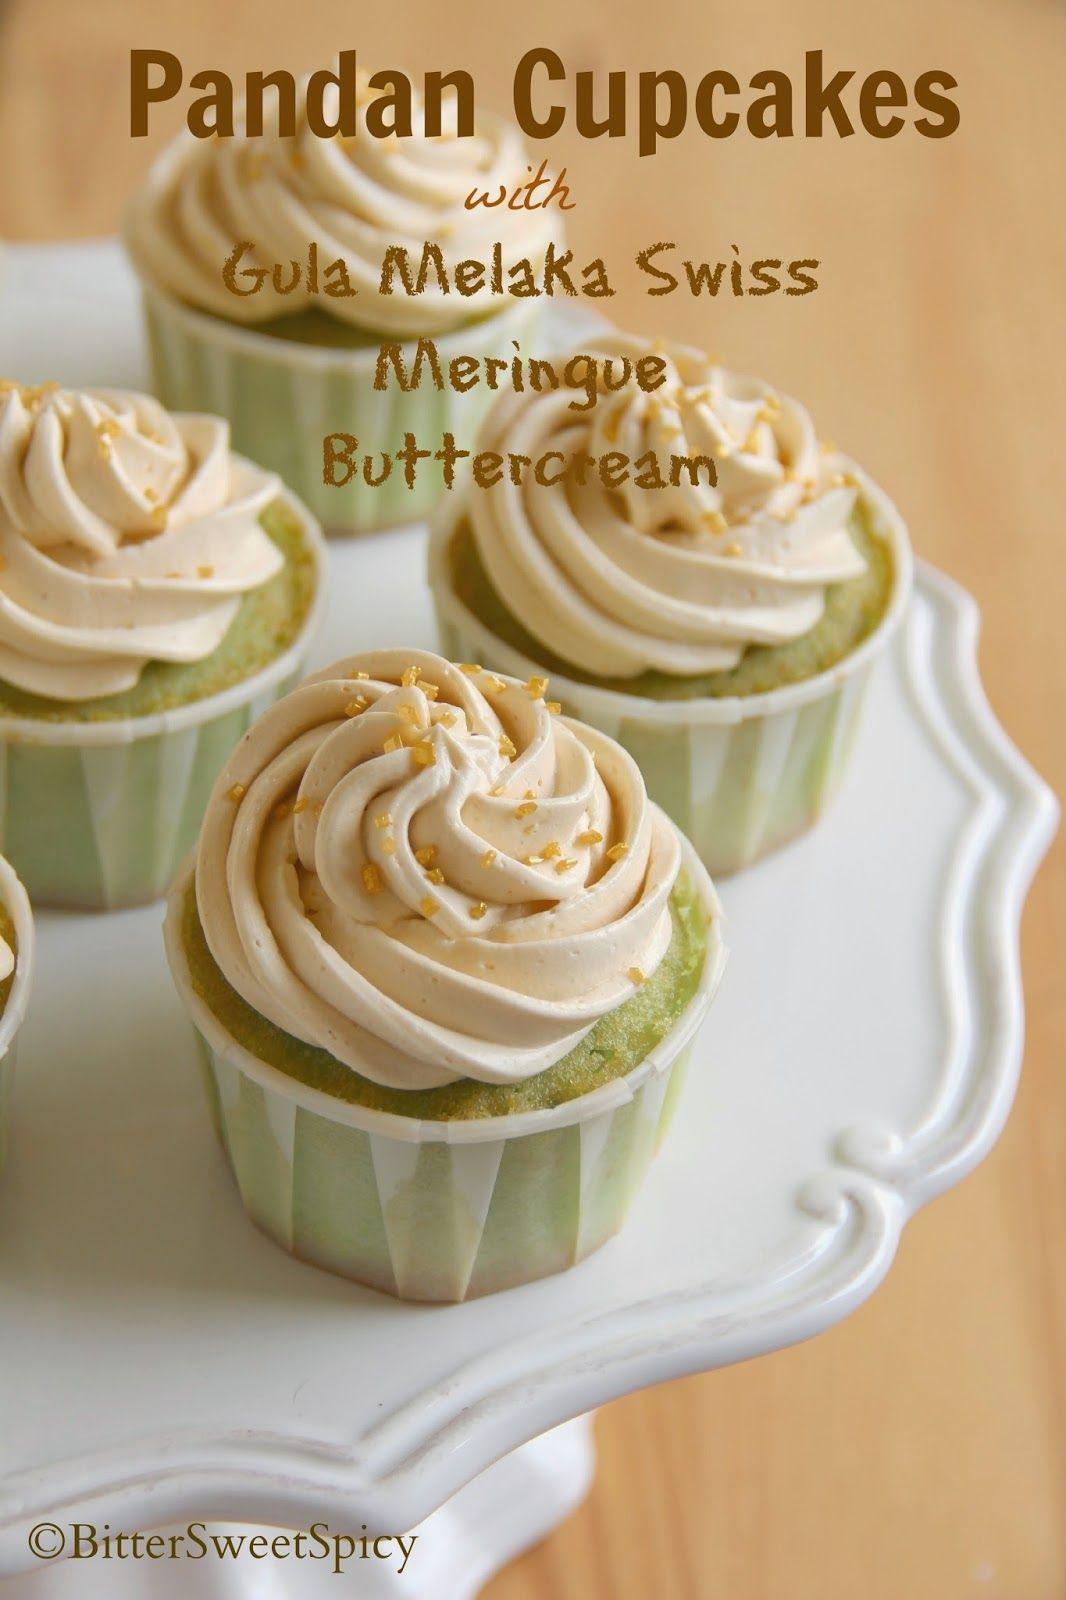 Pandan Cupcakes With Gula Melaka Swiss Meringue Buttercream Frosting Biitersweetspicy Pandan Cupcakes Recipe Pandan Cake Cupcake Cakes